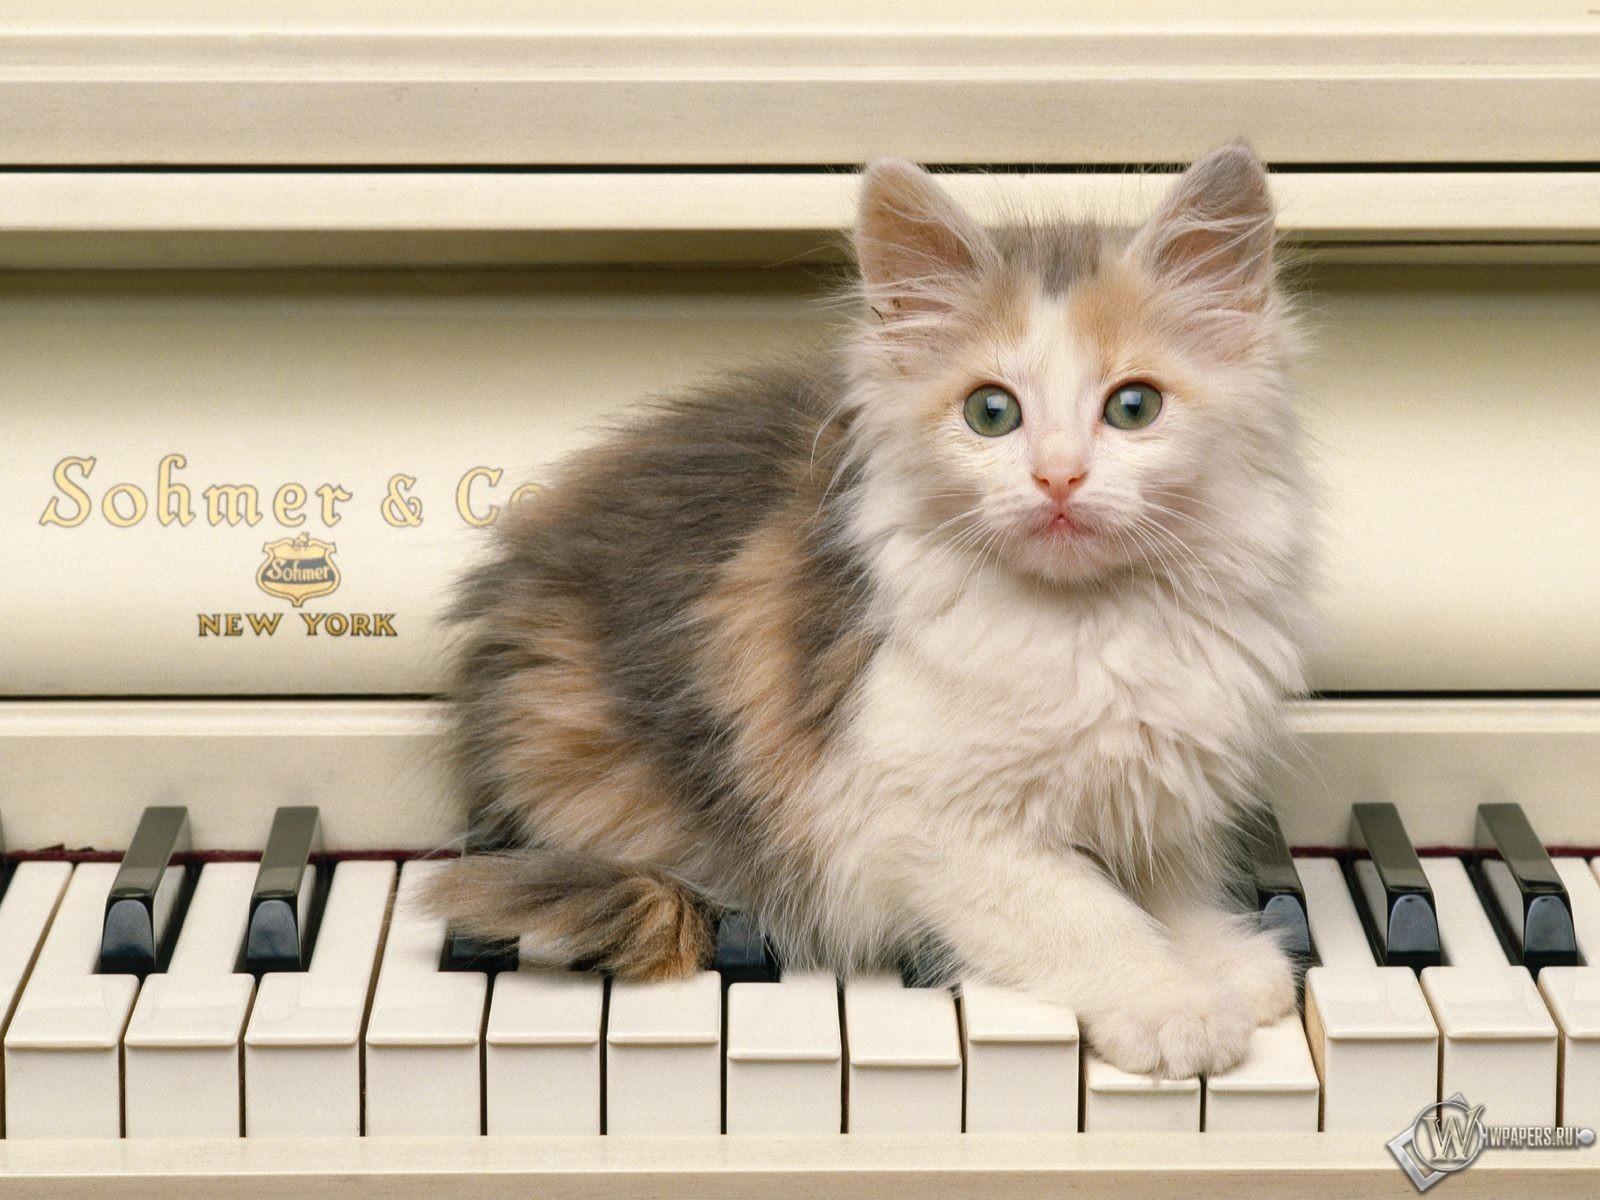 Котенок на пианино 1600x1200